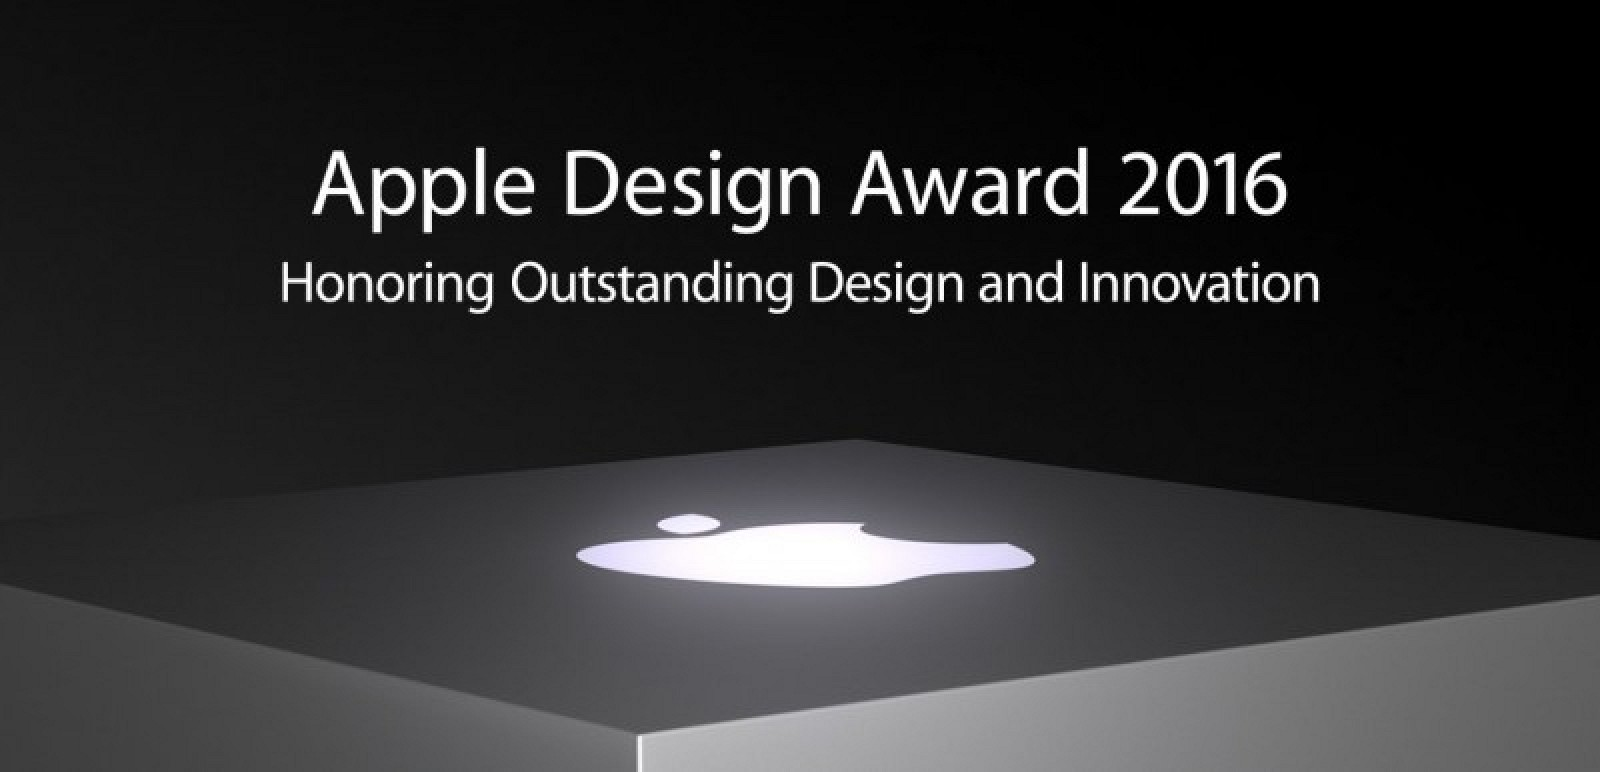 Black Friday Car Deals >> 2016 Apple Design Award Winners Announced: Lara Croft Go ...